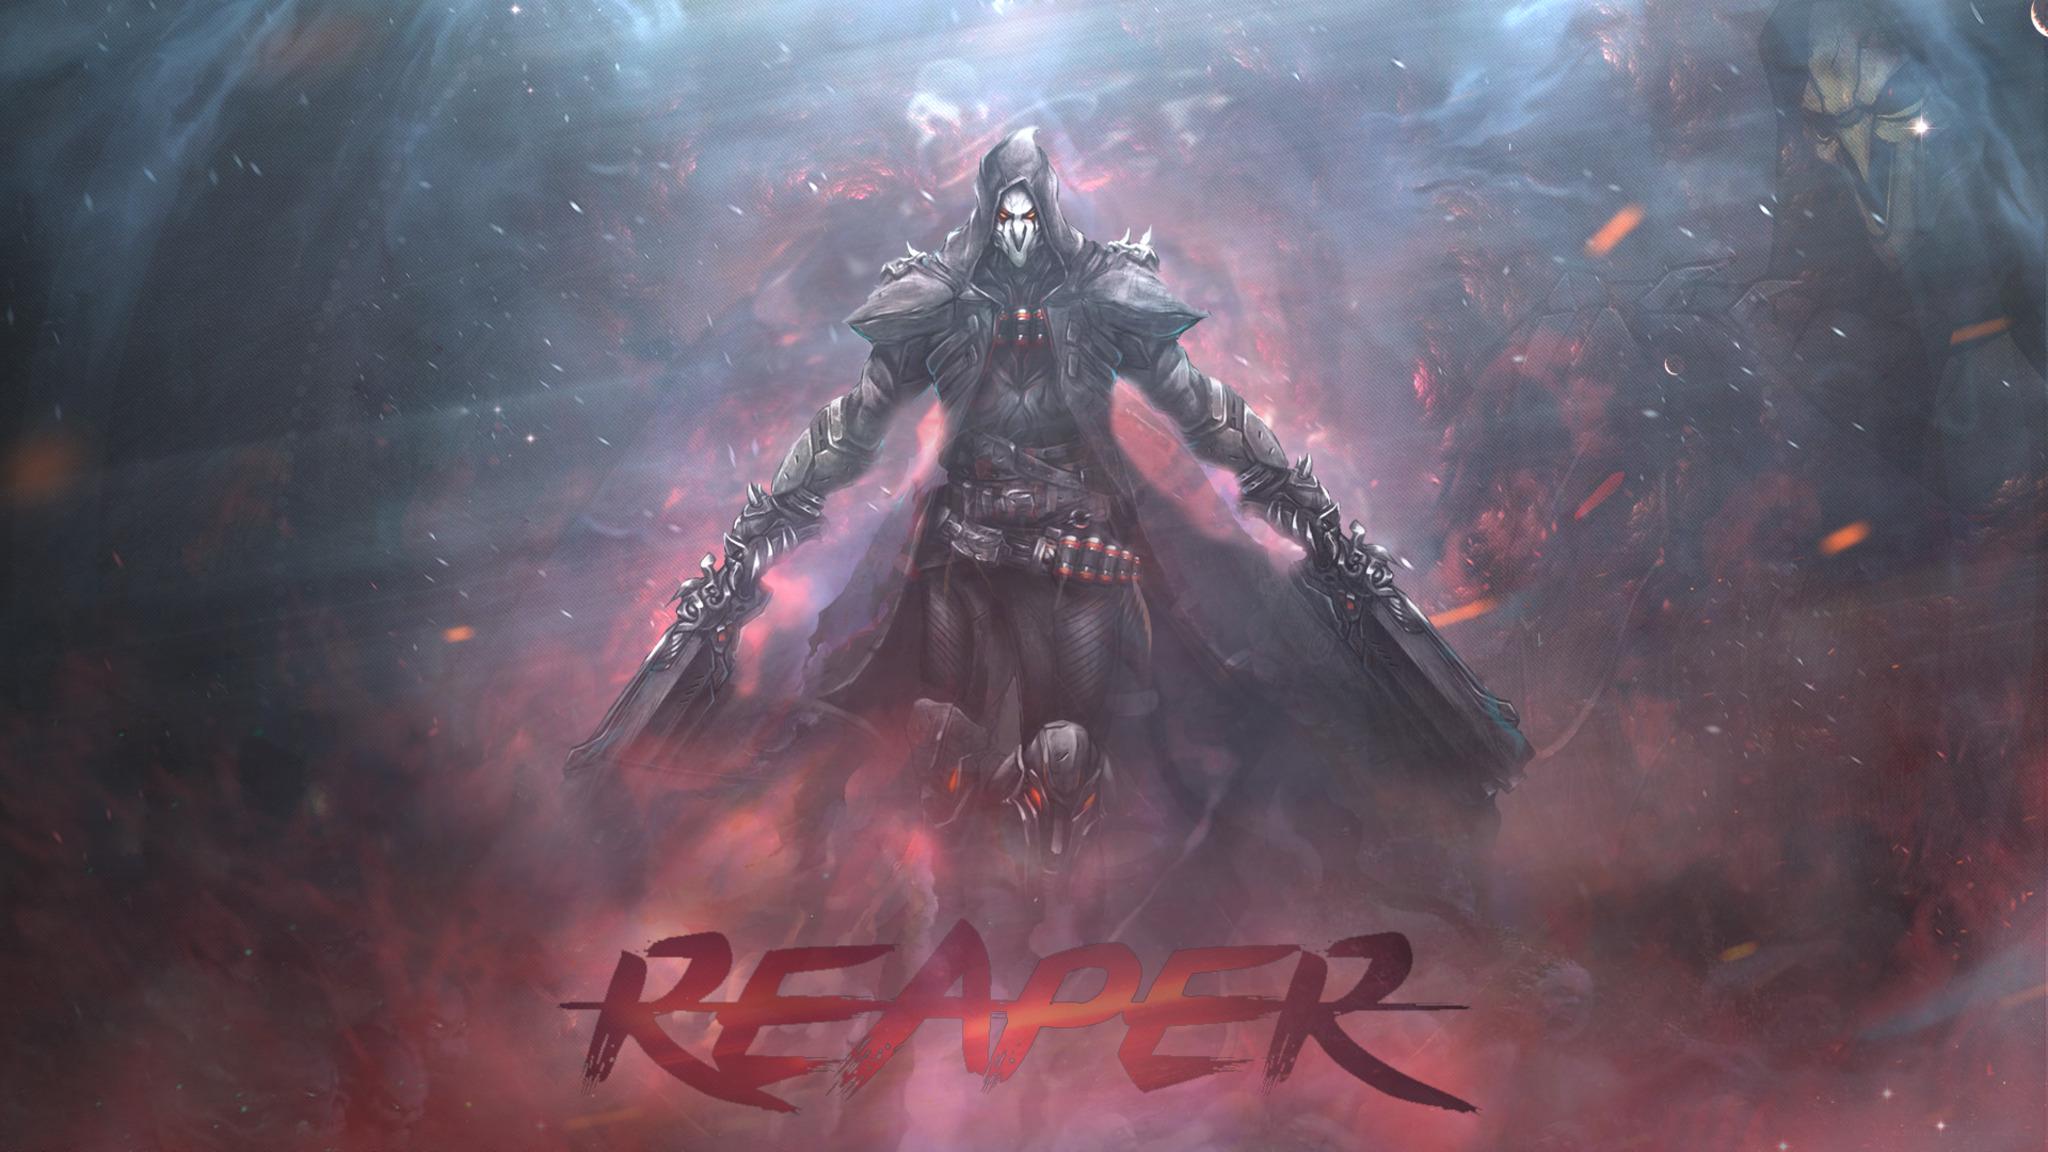 2048x1152 Reaper Overwatch 2048x1152 Resolution HD 4k ...